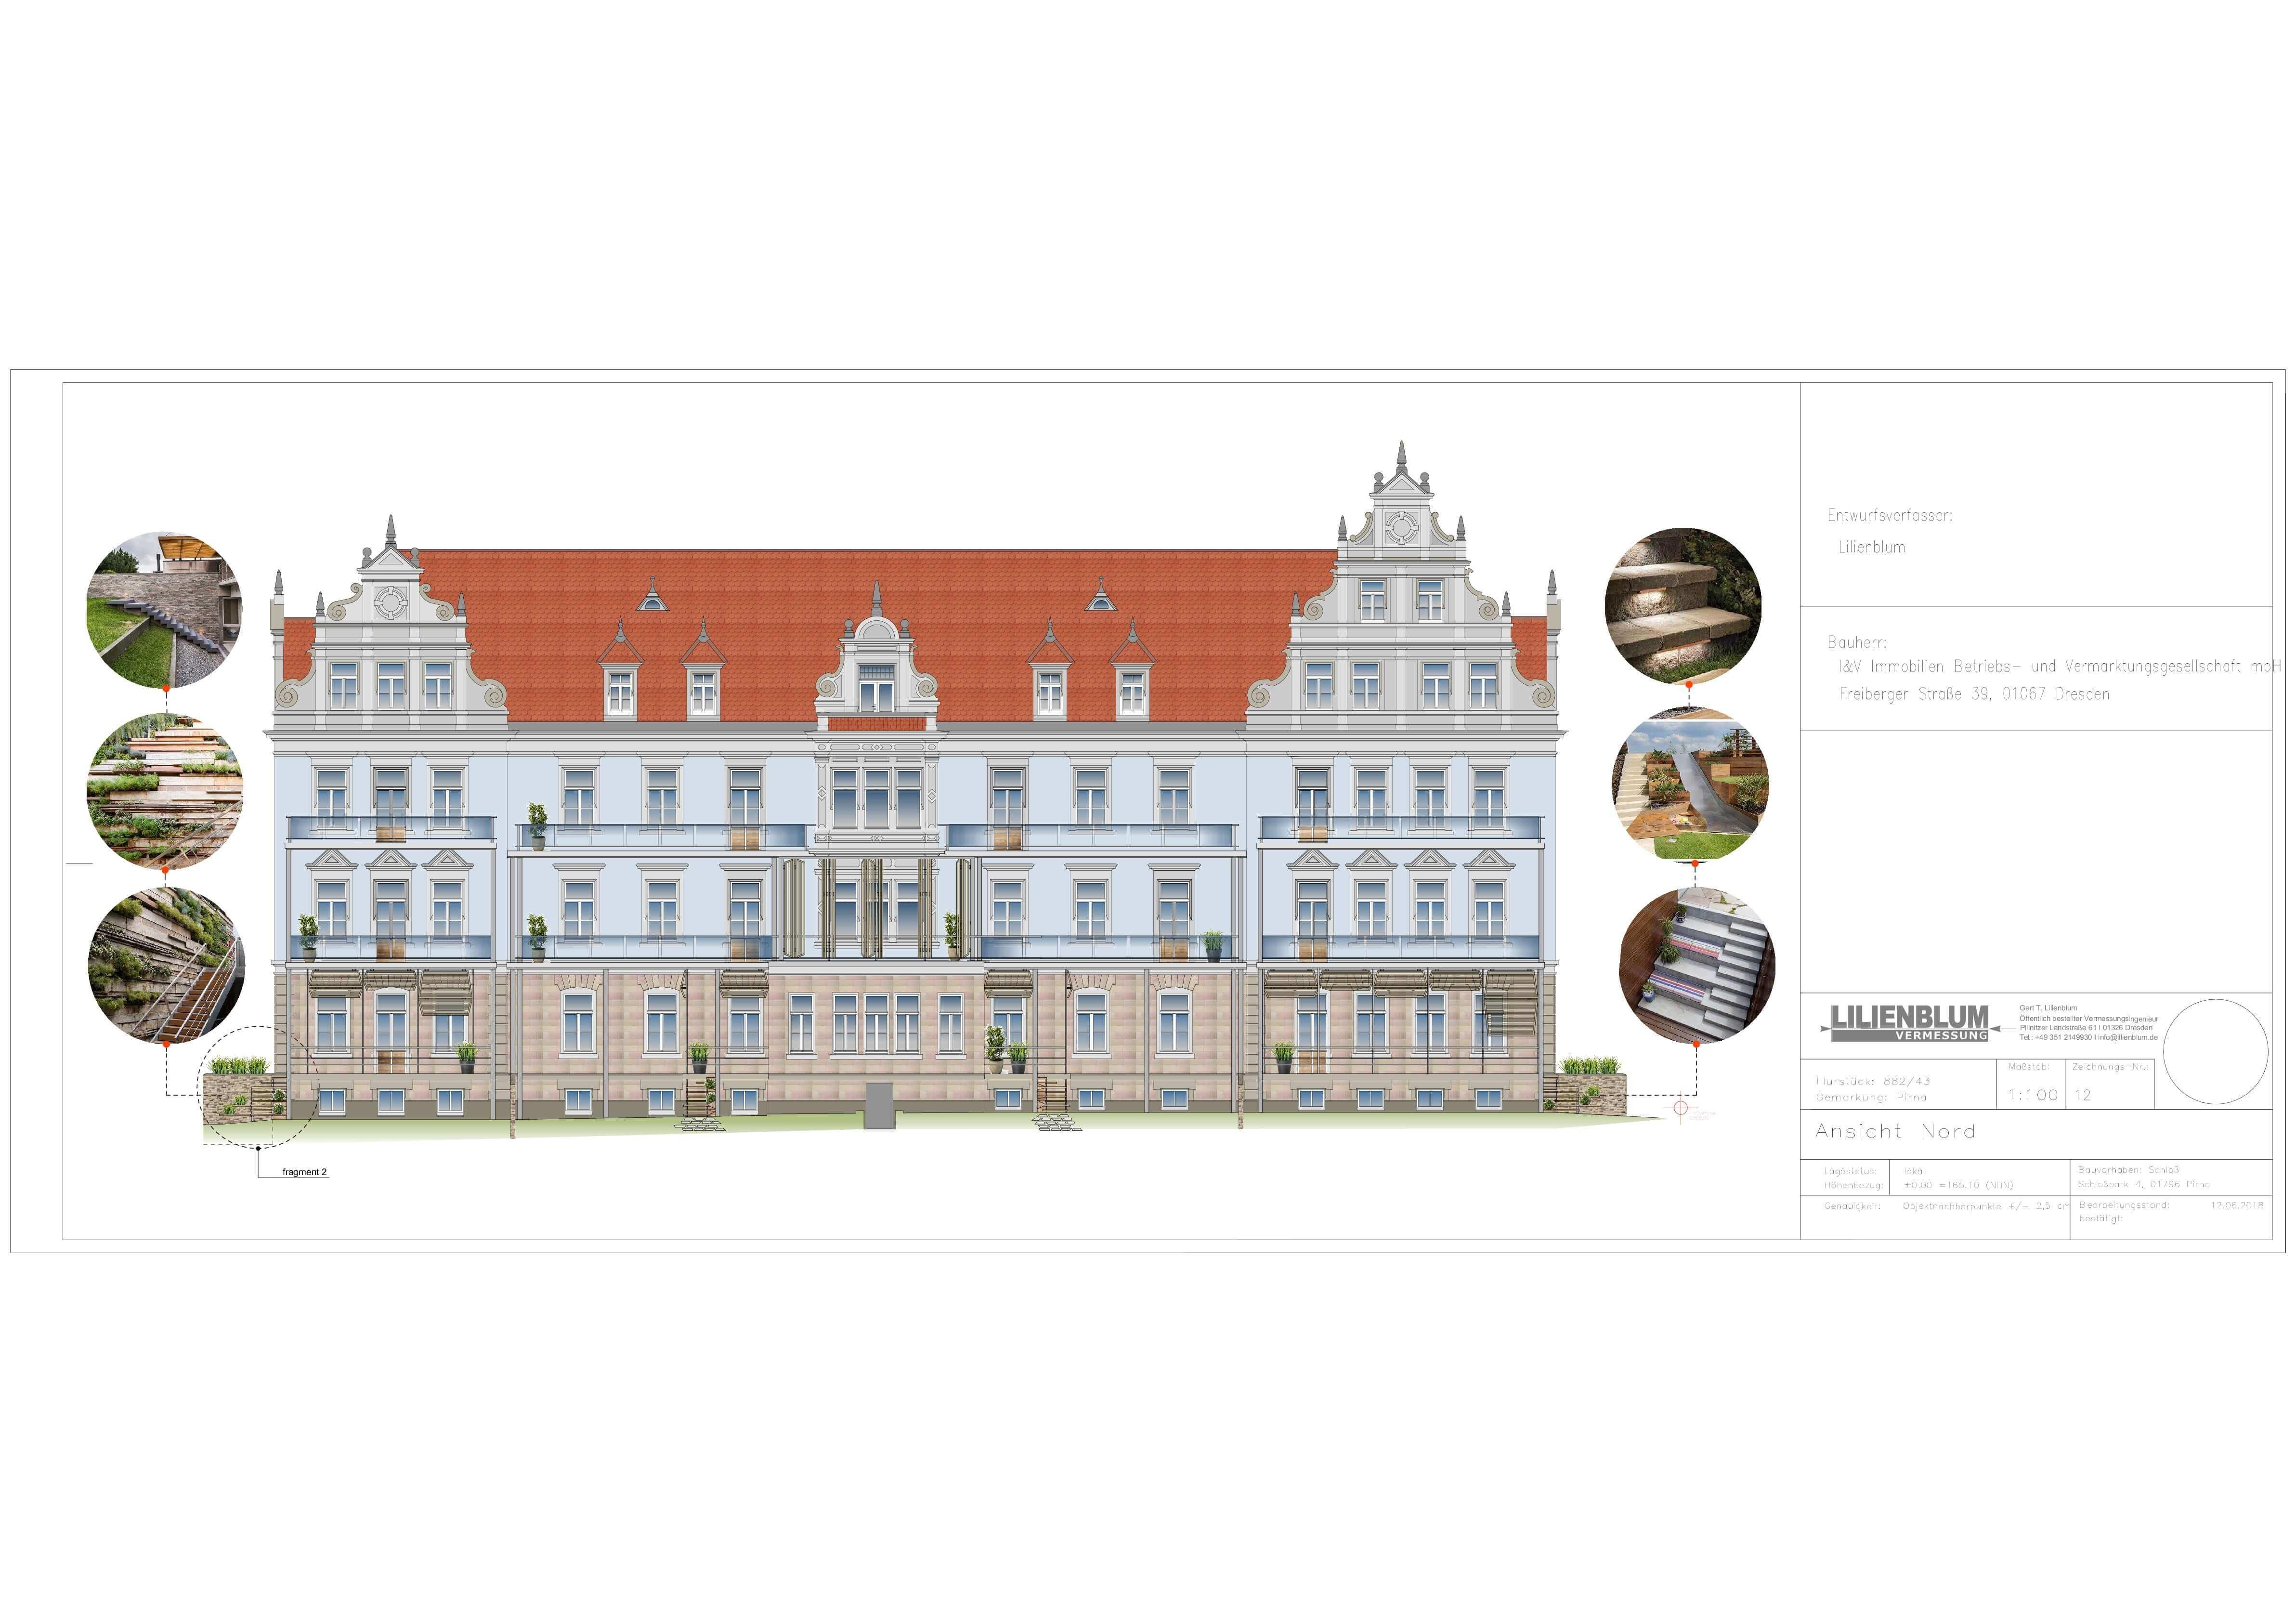 реконструкция фасада здания Пирна